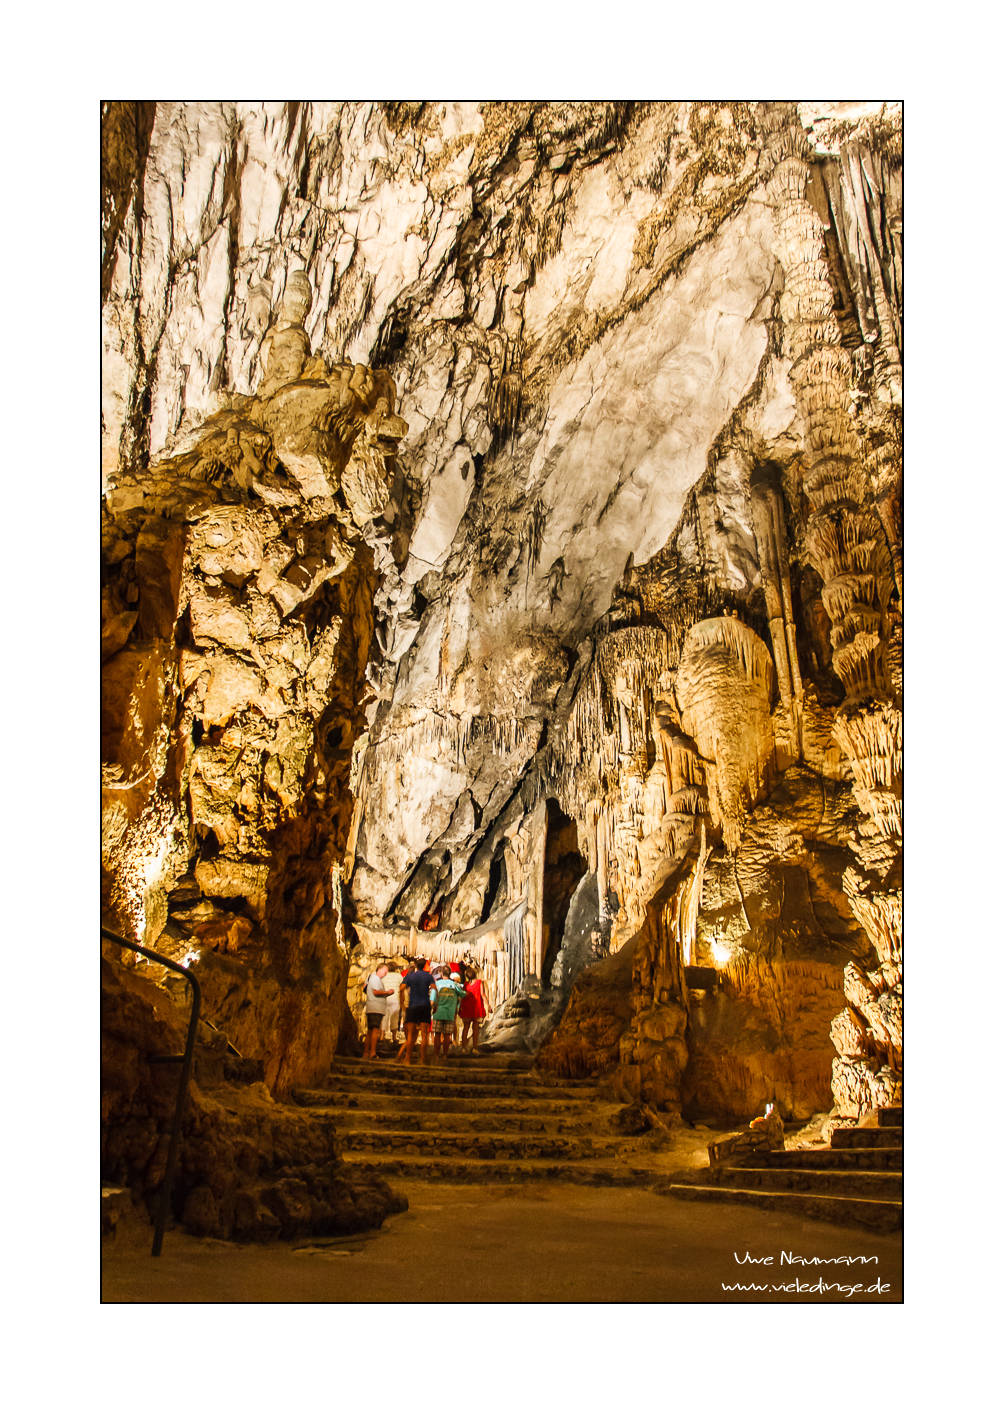 Cuevas de Artá, Höhlen von Artá